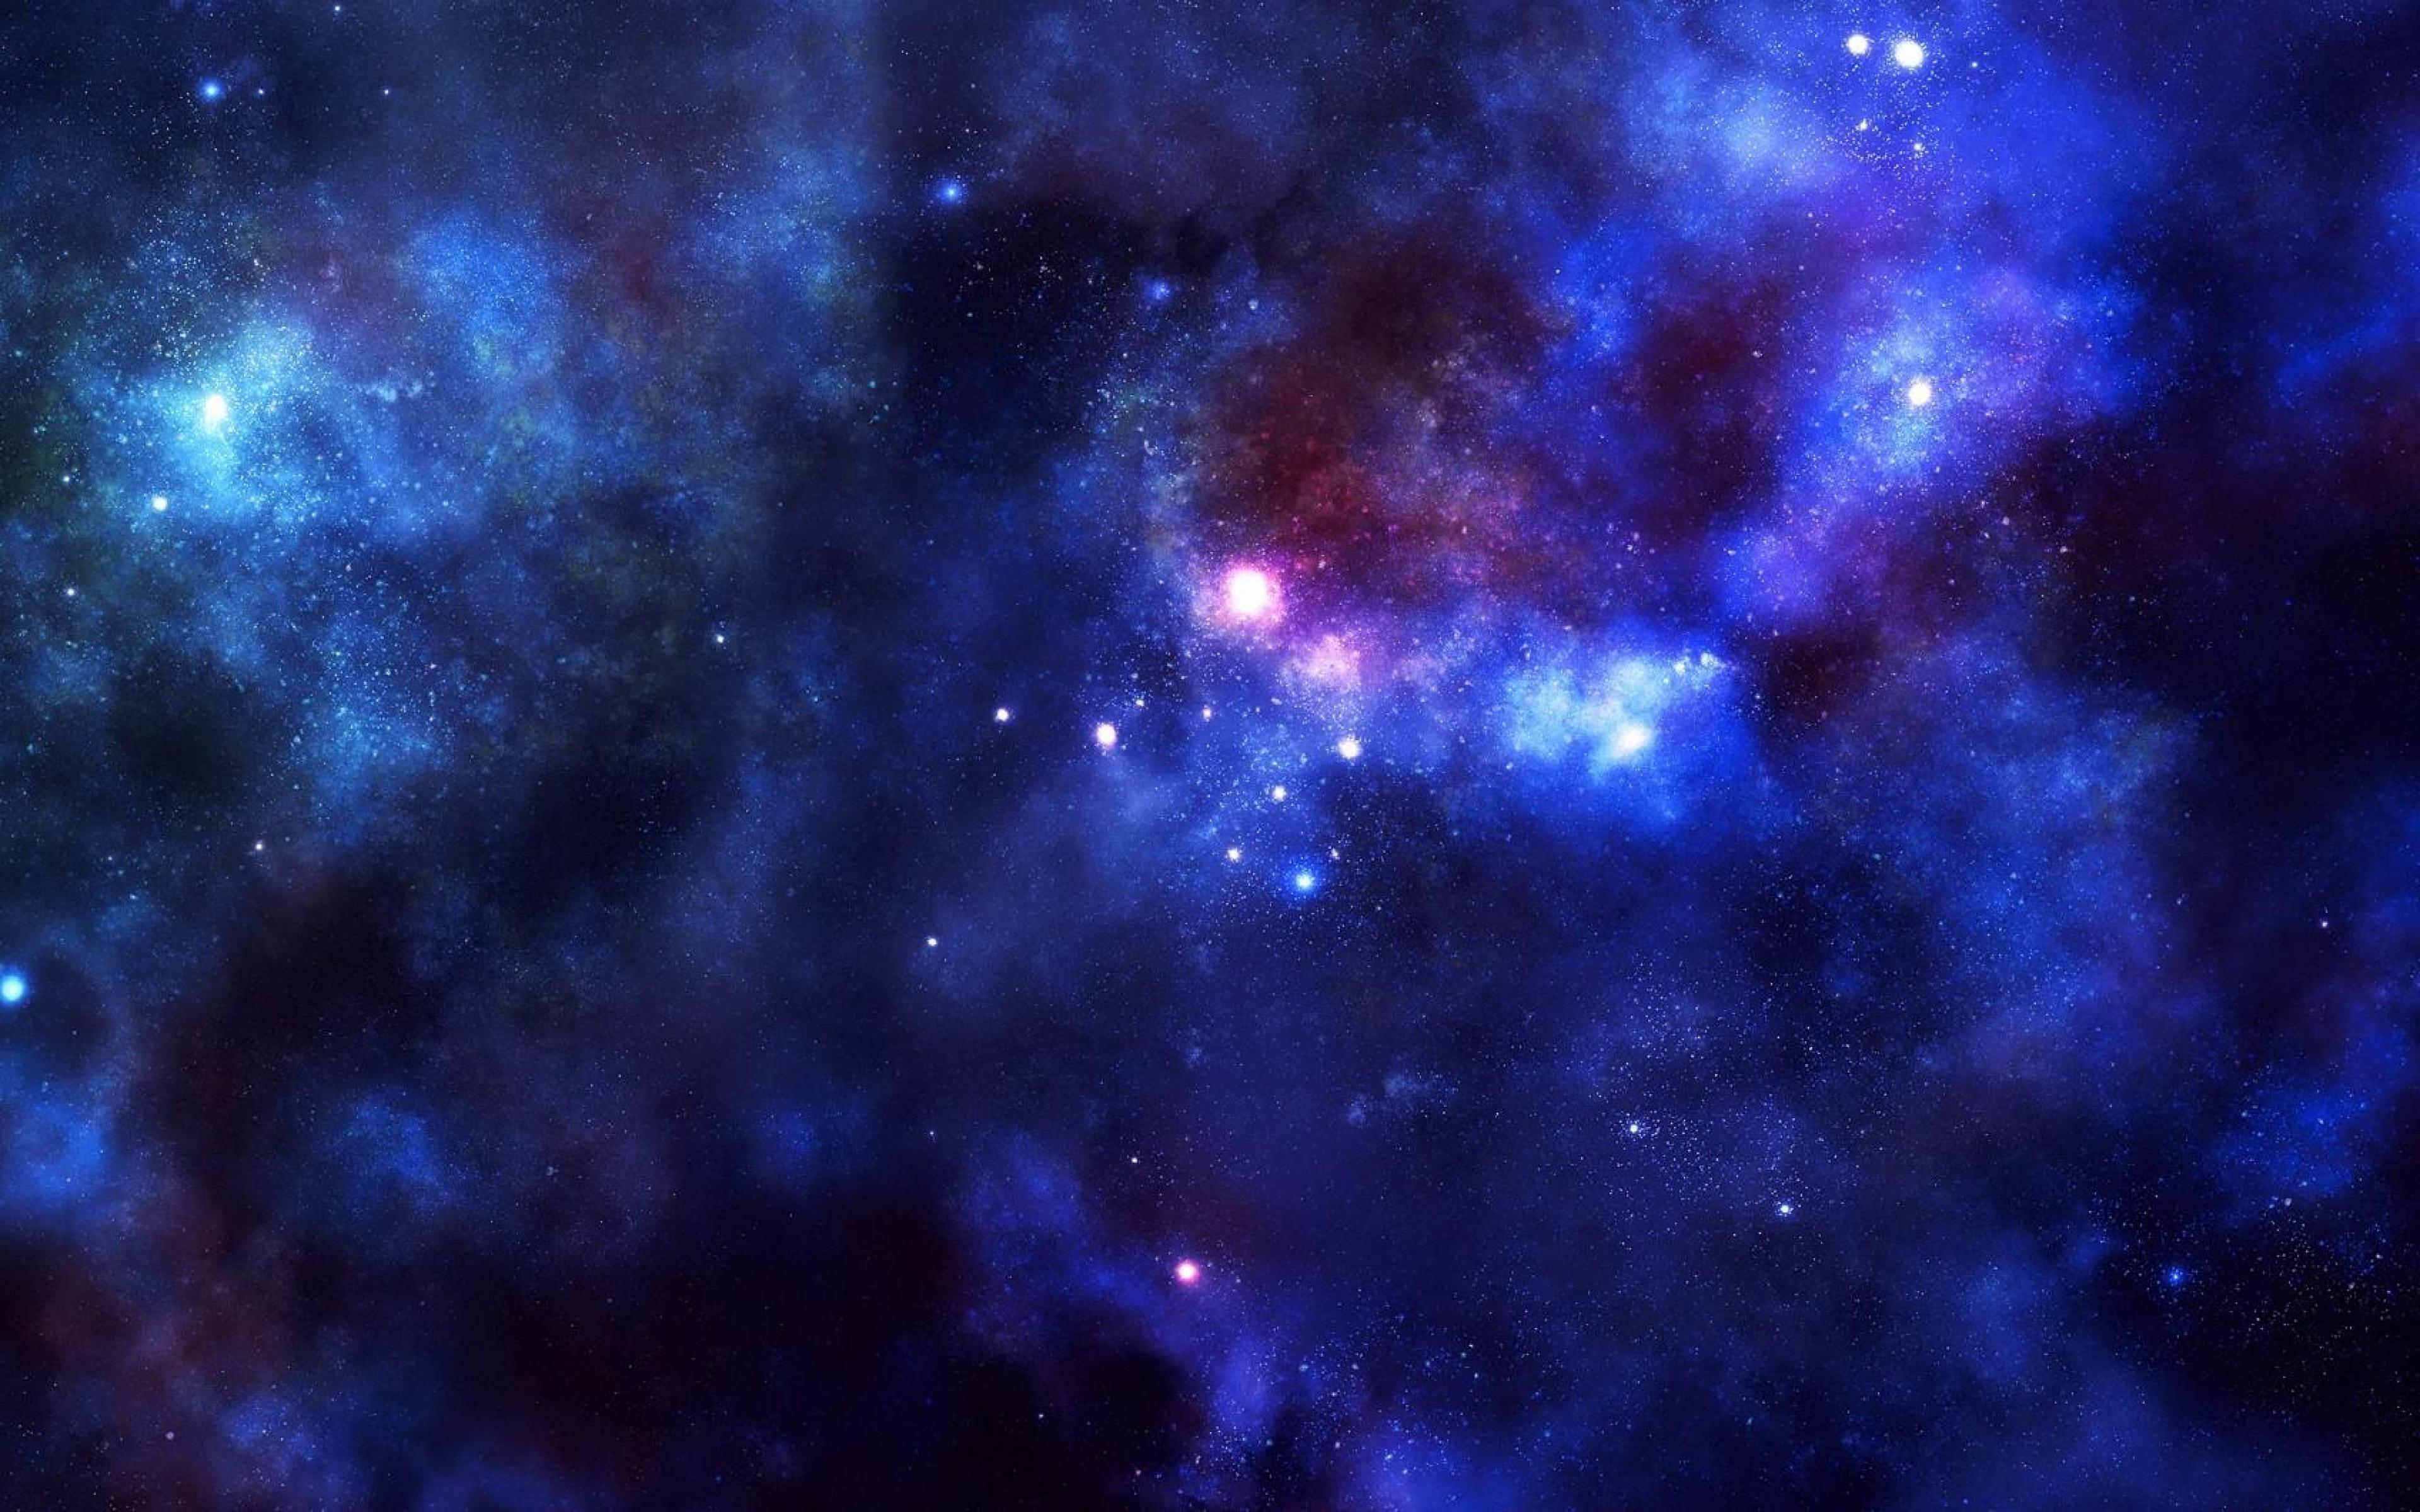 Nebula Wallpaper High Quality 3840x2400